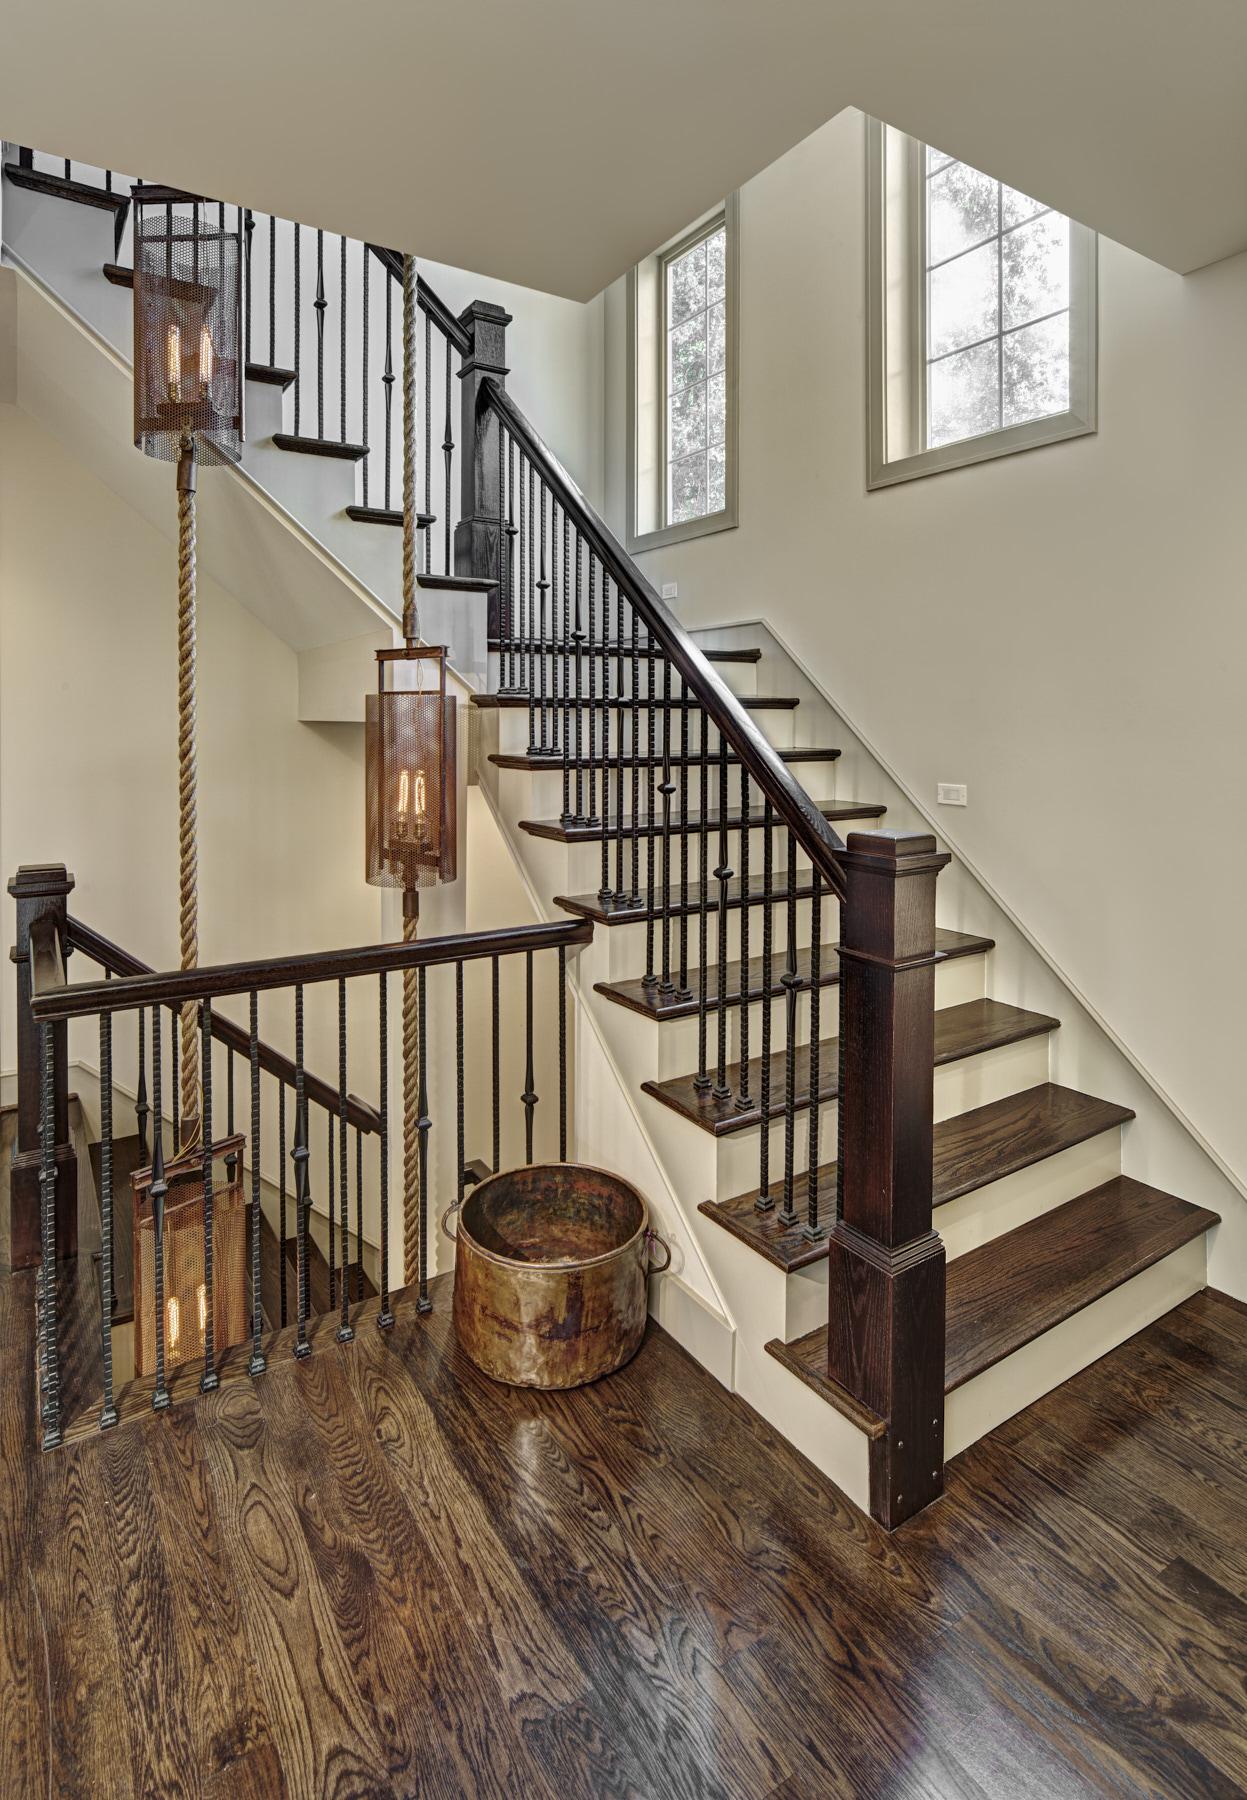 Stairs-1656 Humphrey-0267-HDR.jpg